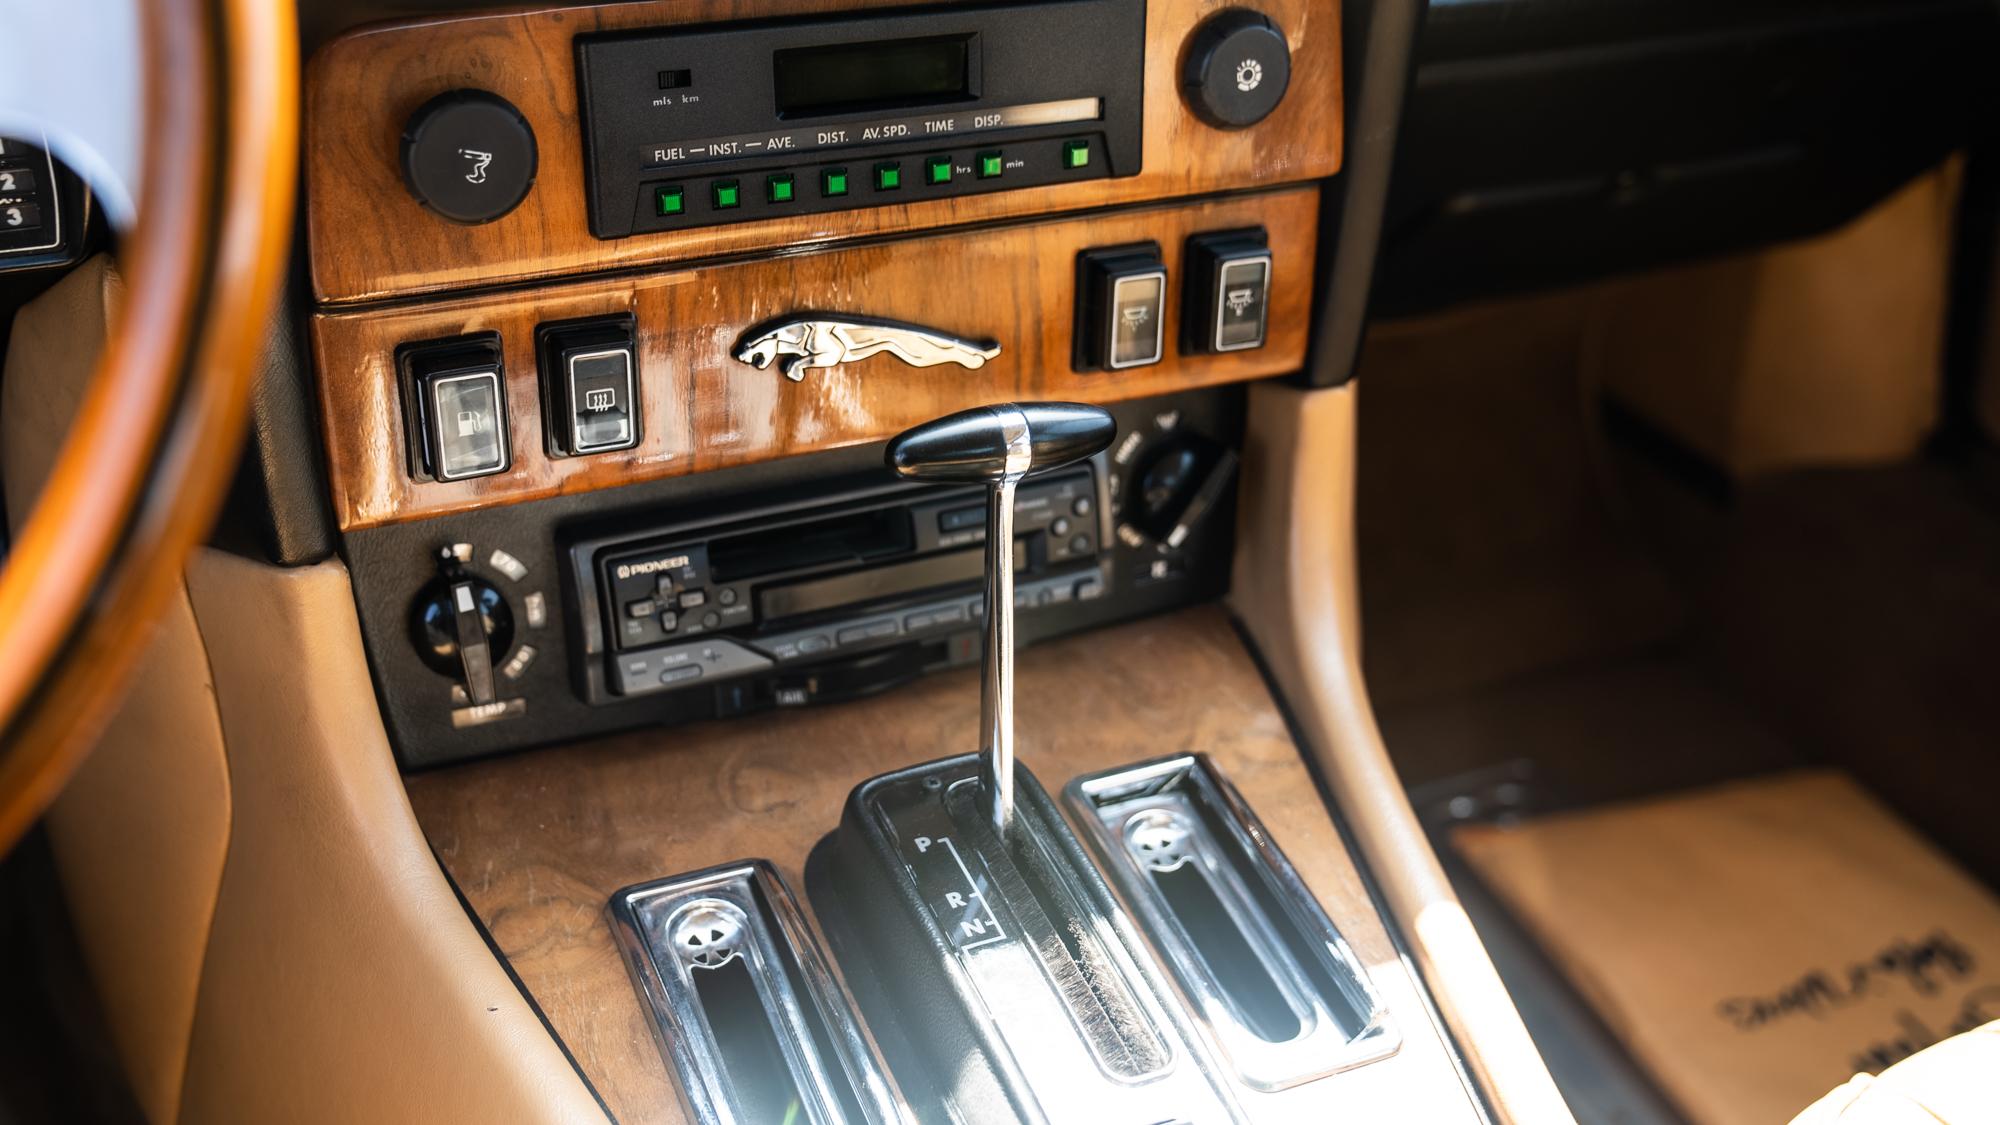 1986 Jaguar XJ6 shifter